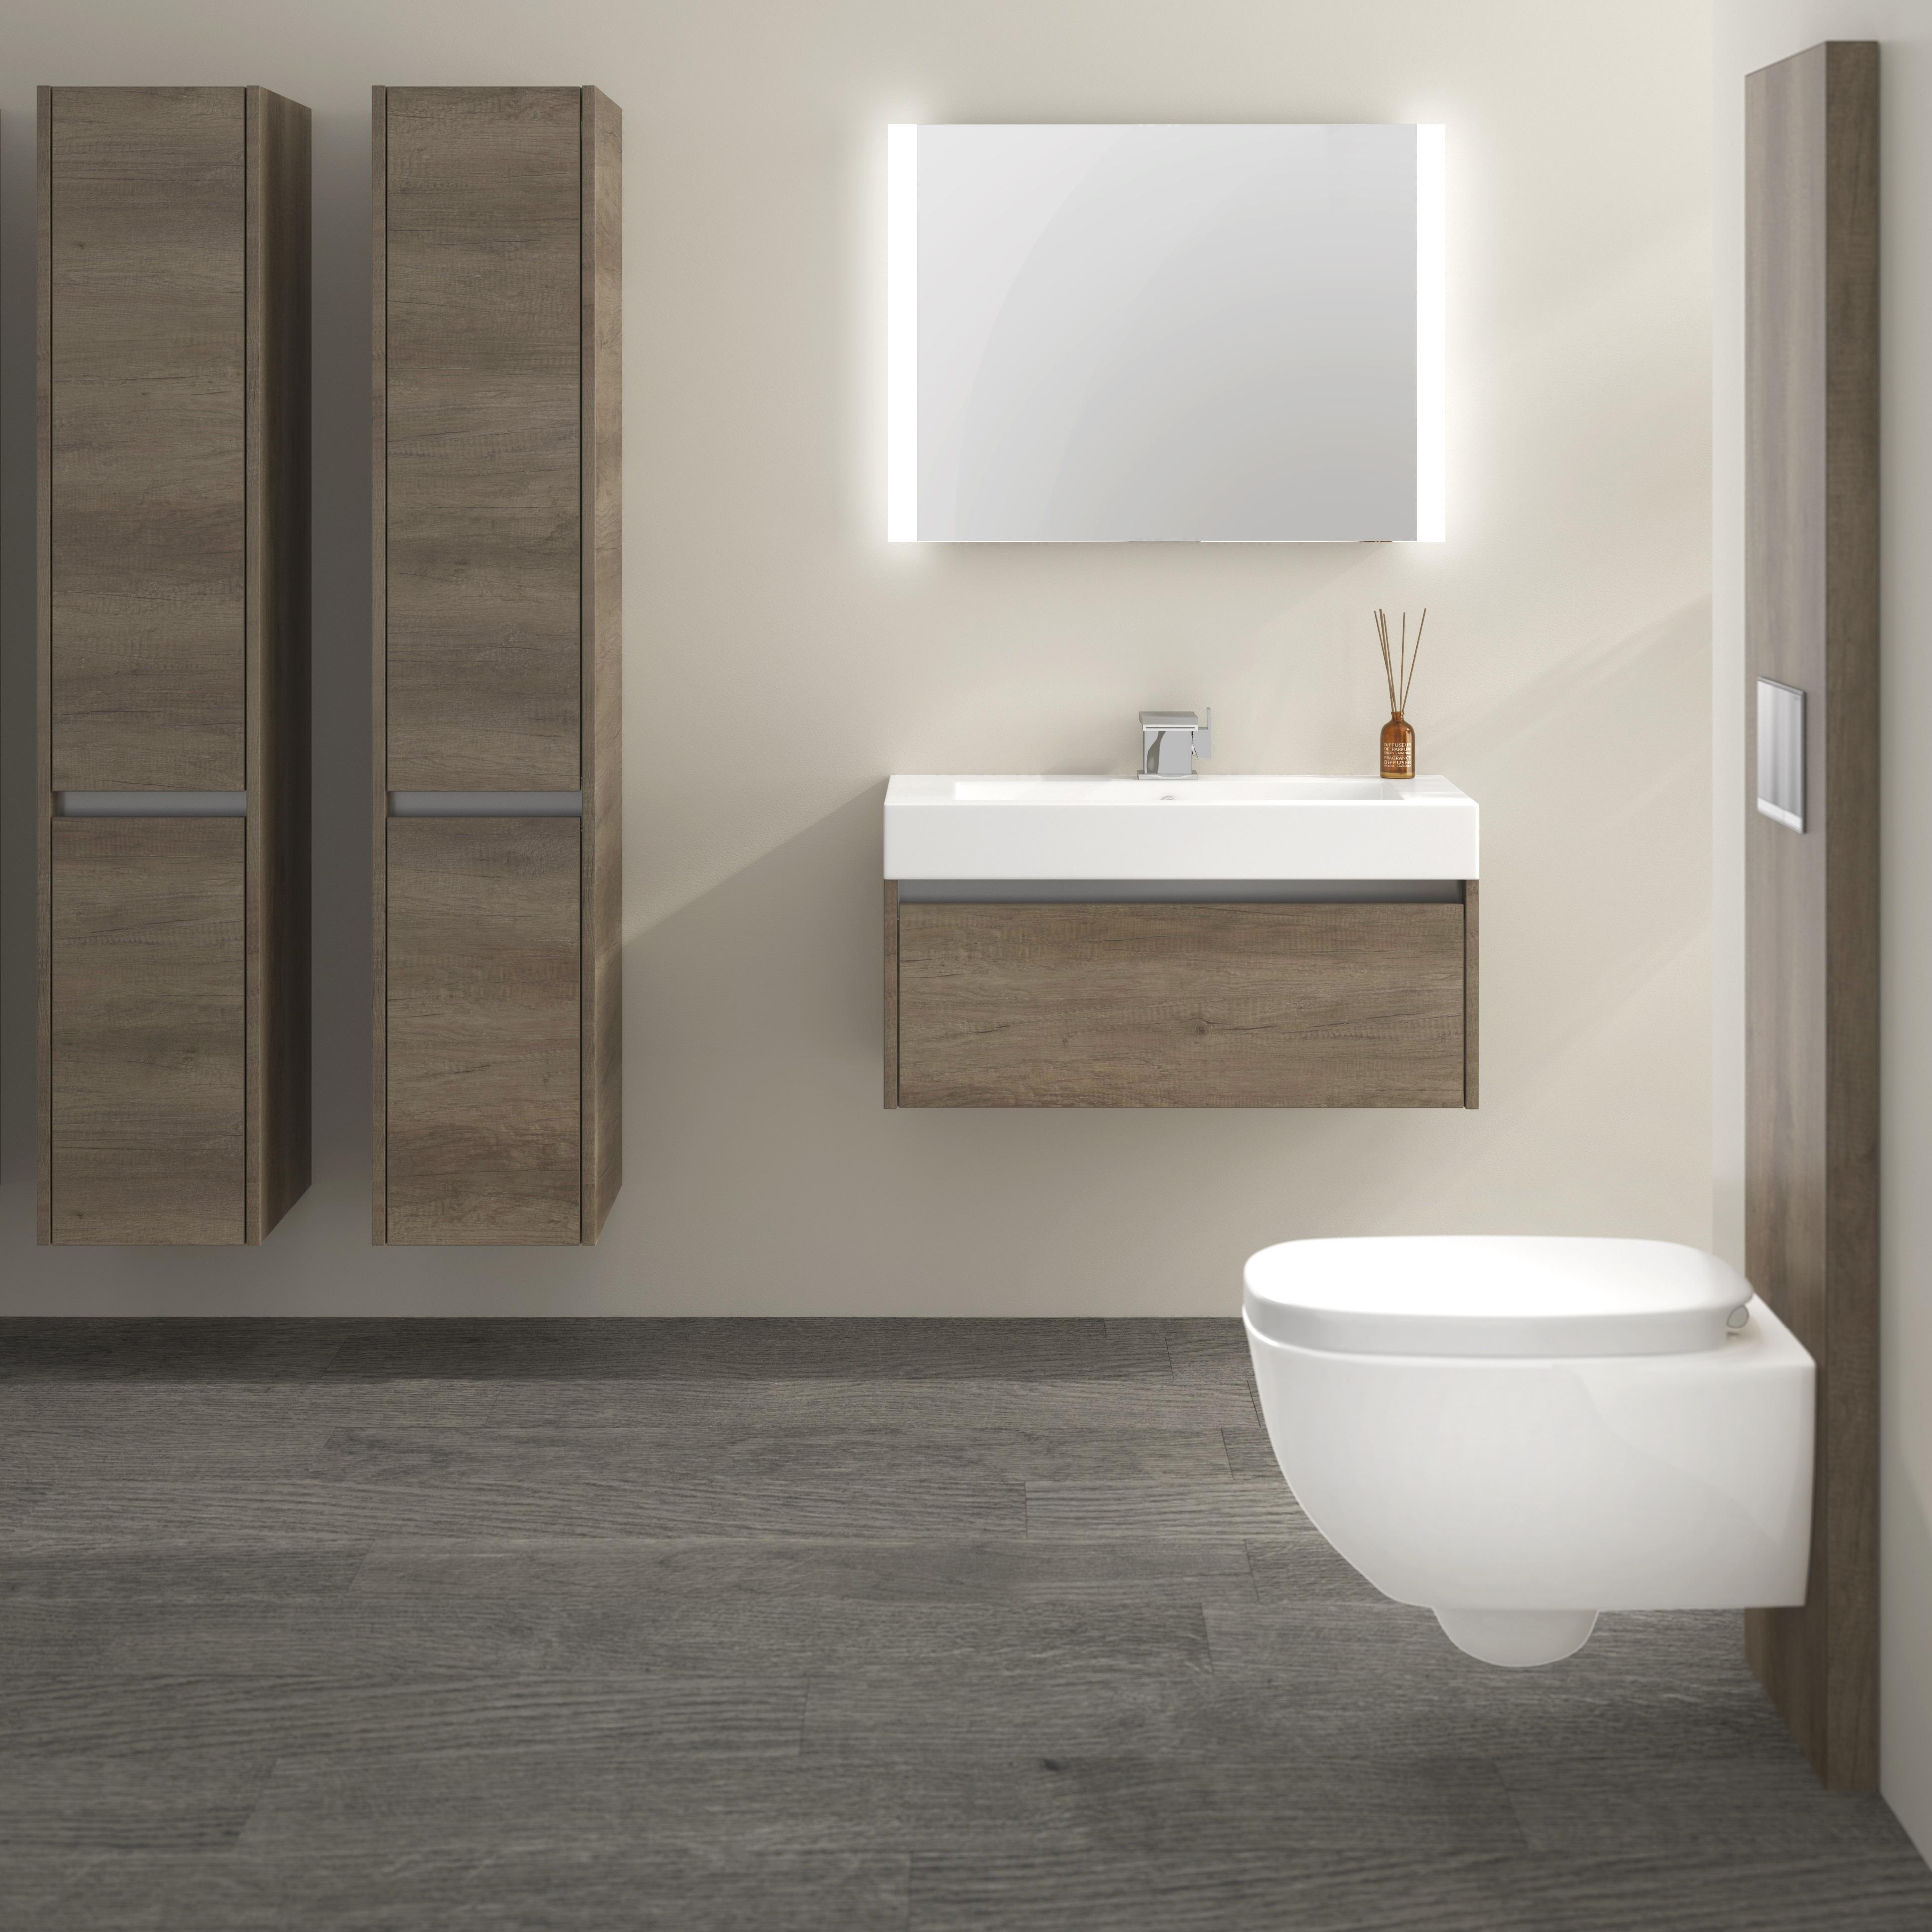 Kitchen Bathroom Exhibition Uk: Made To Measure Bathroom Furniture